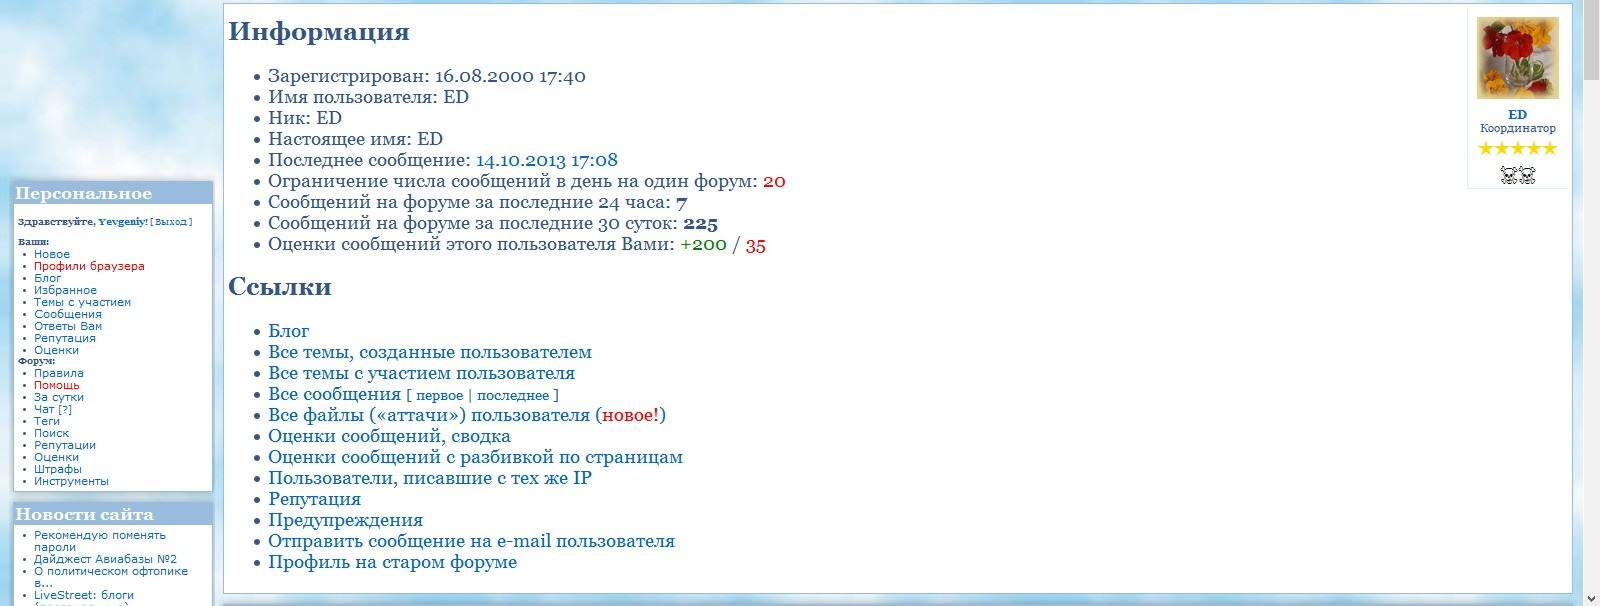 Ed screen.jpg